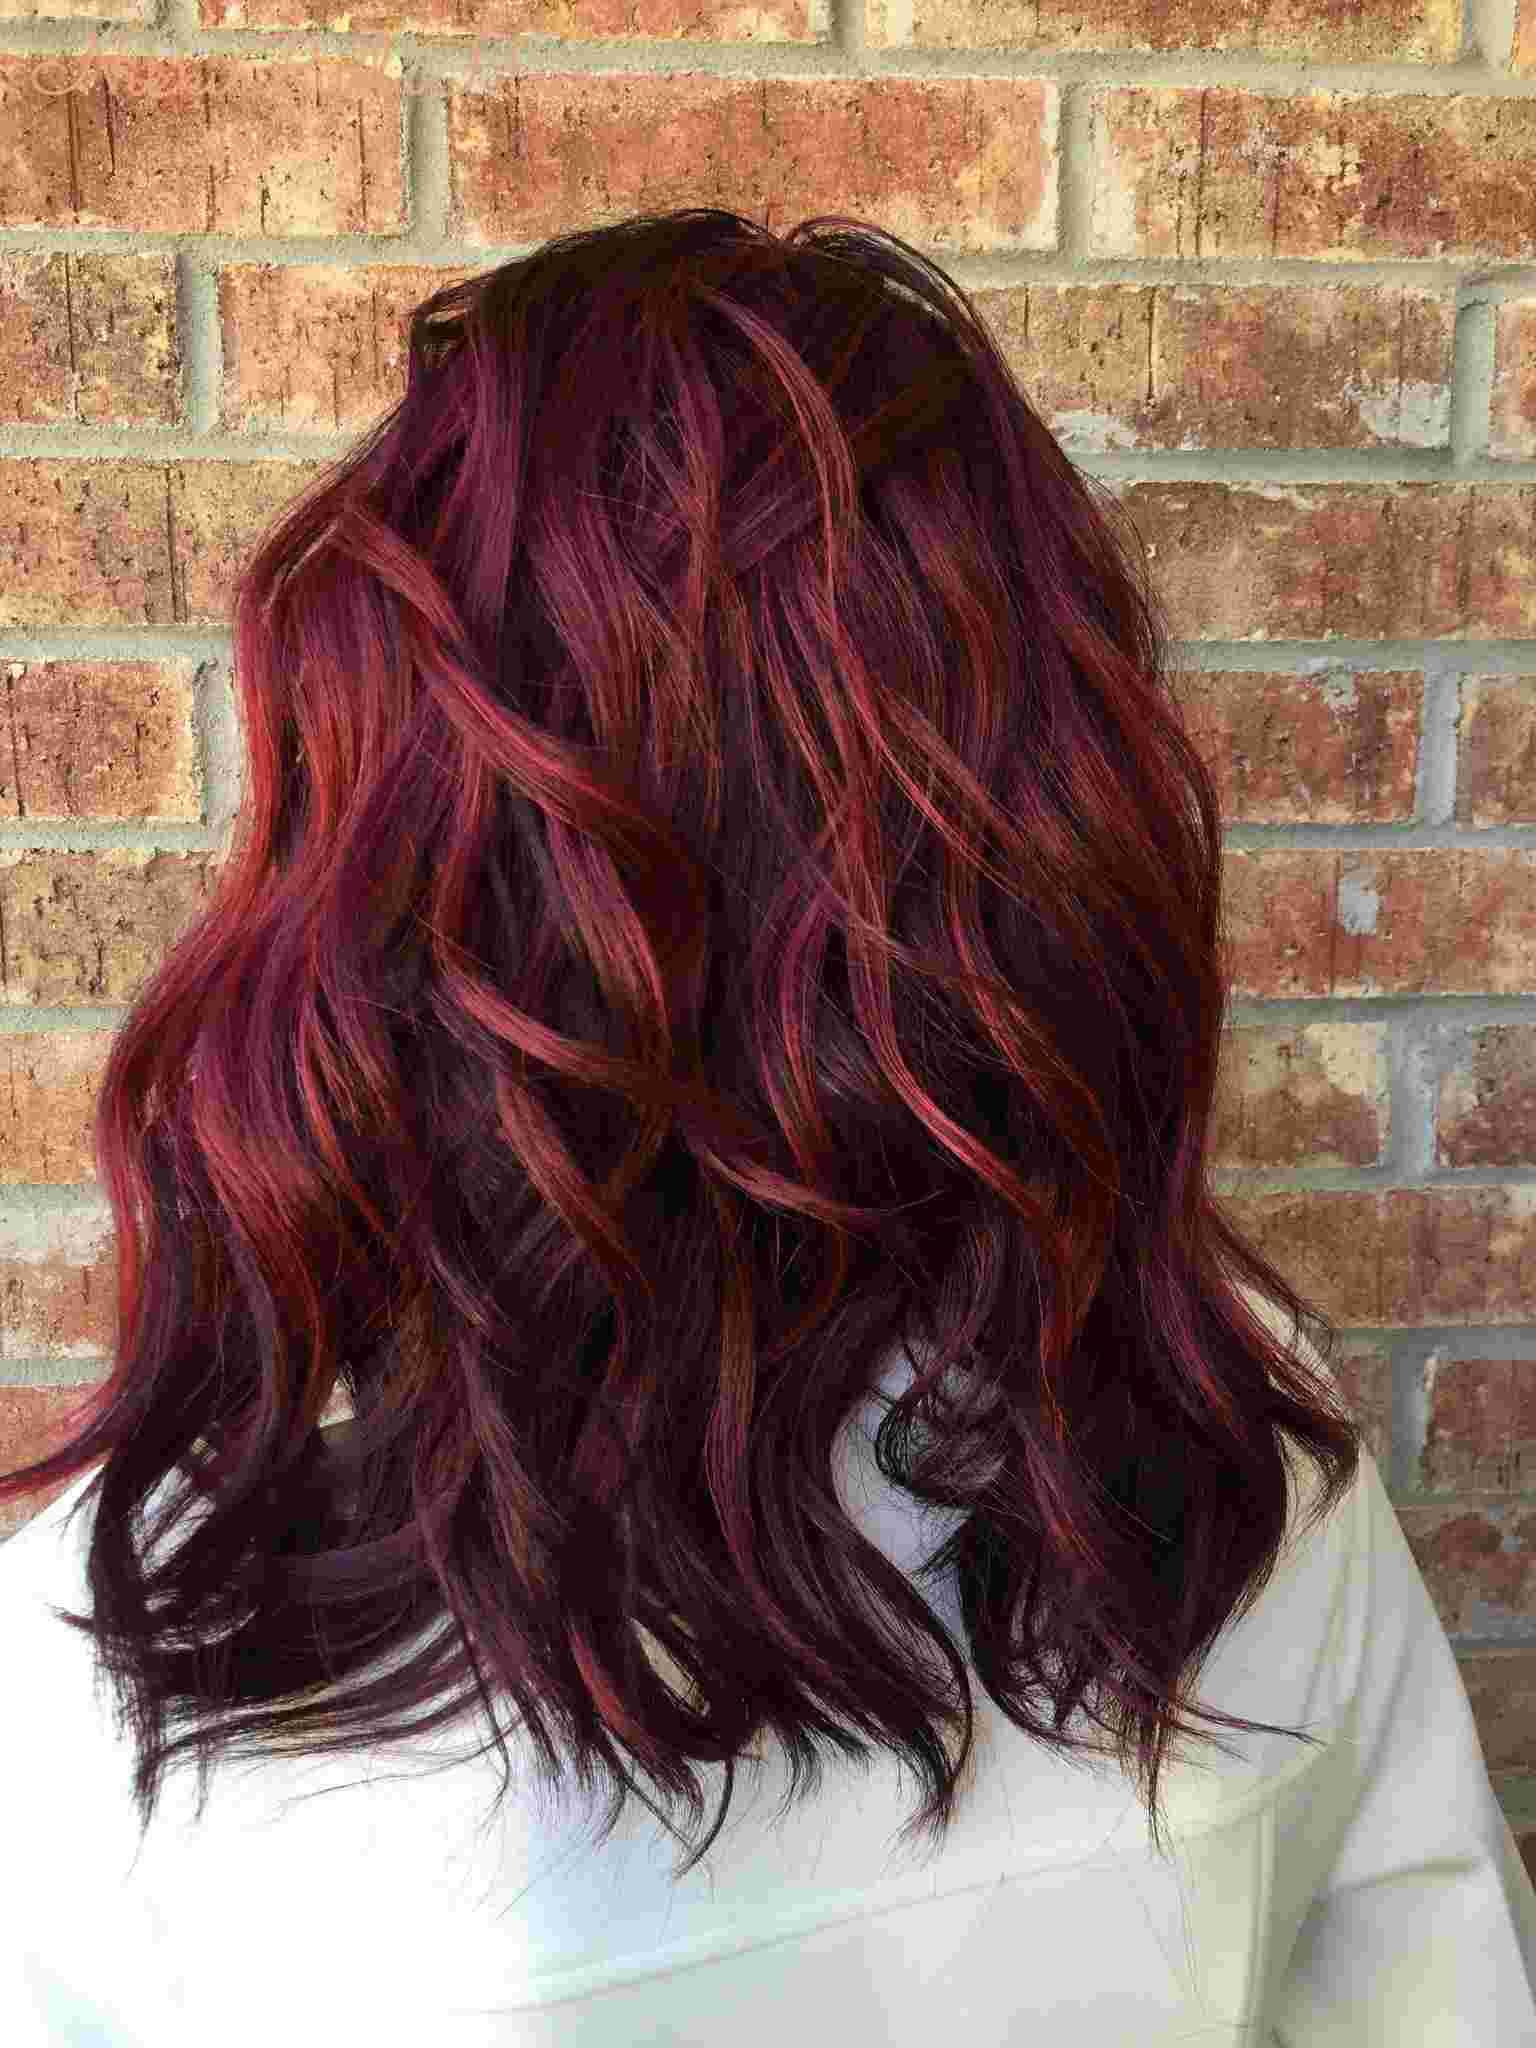 Balayage Rot Haartrend Kirschrot Haarfarbe welcher Hautton Frisurenideen Frauen